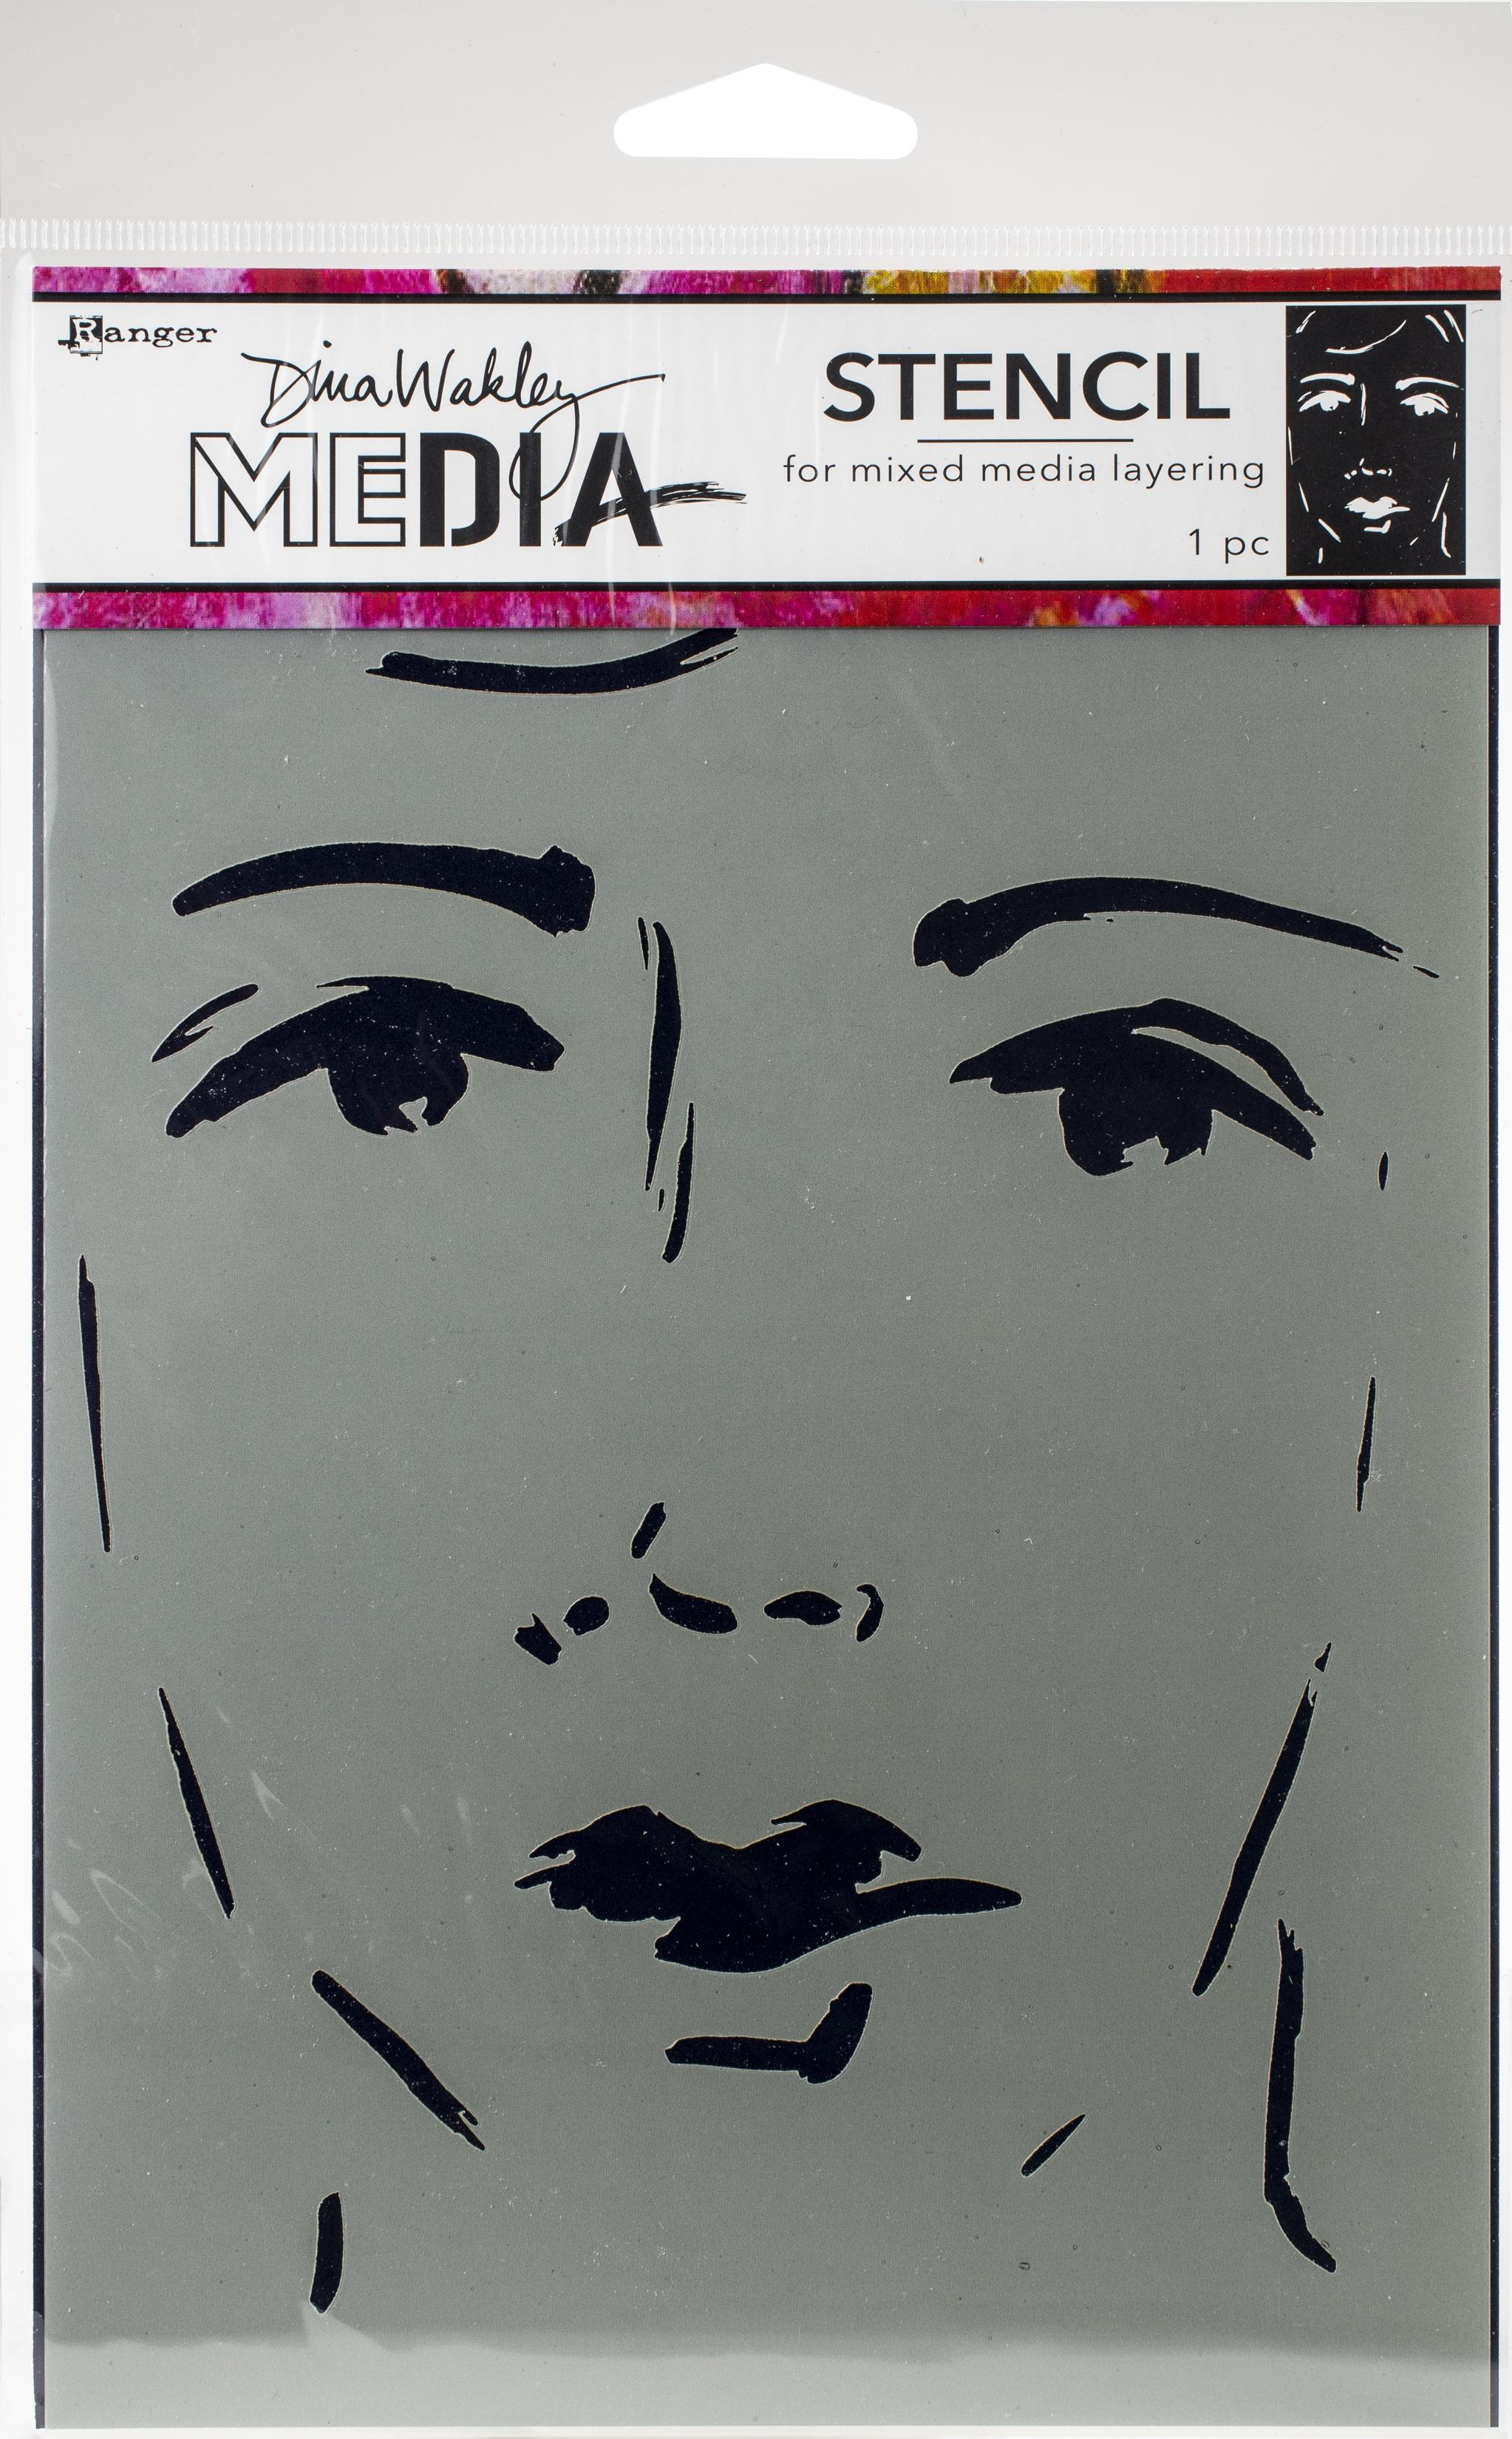 Dina Wakley Media Stencils 9X6-She Sees